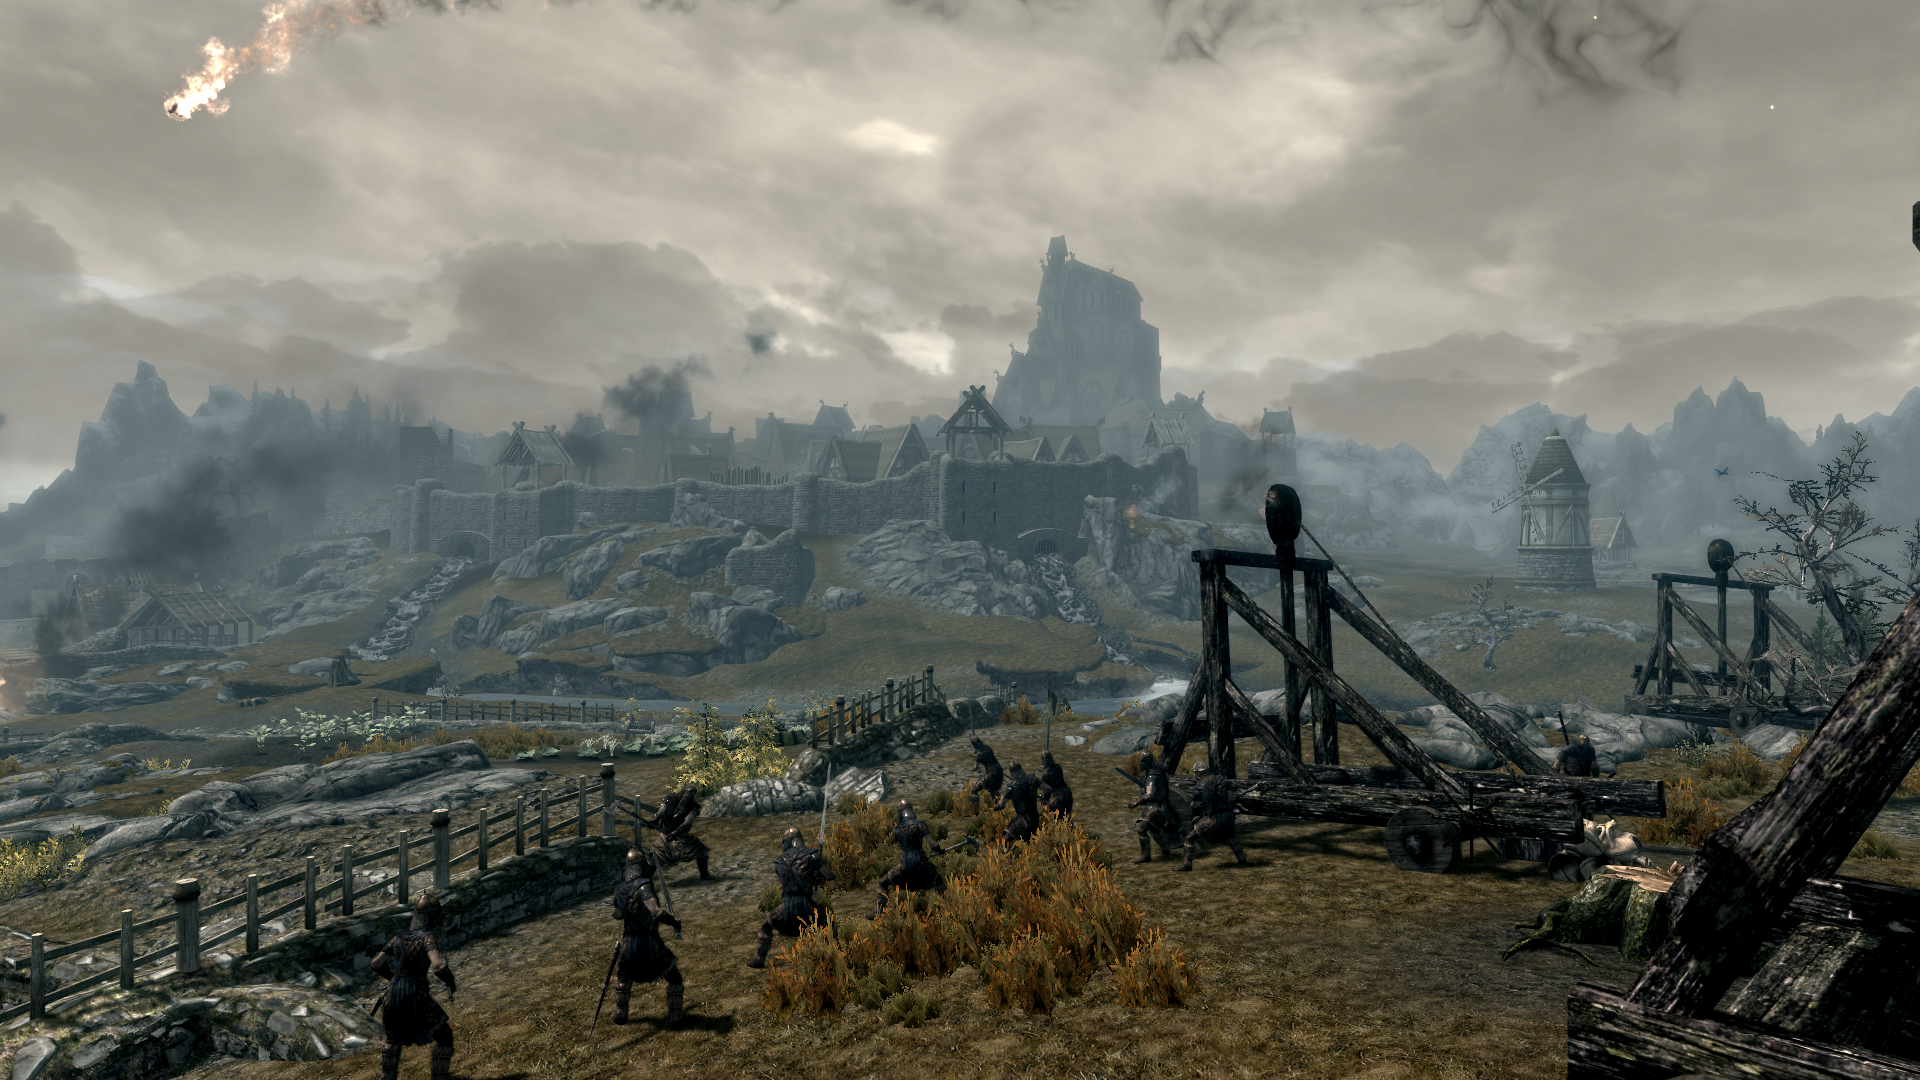 Battle for Whiterun (Stormcloaks) | Elder Scrolls | Fandom